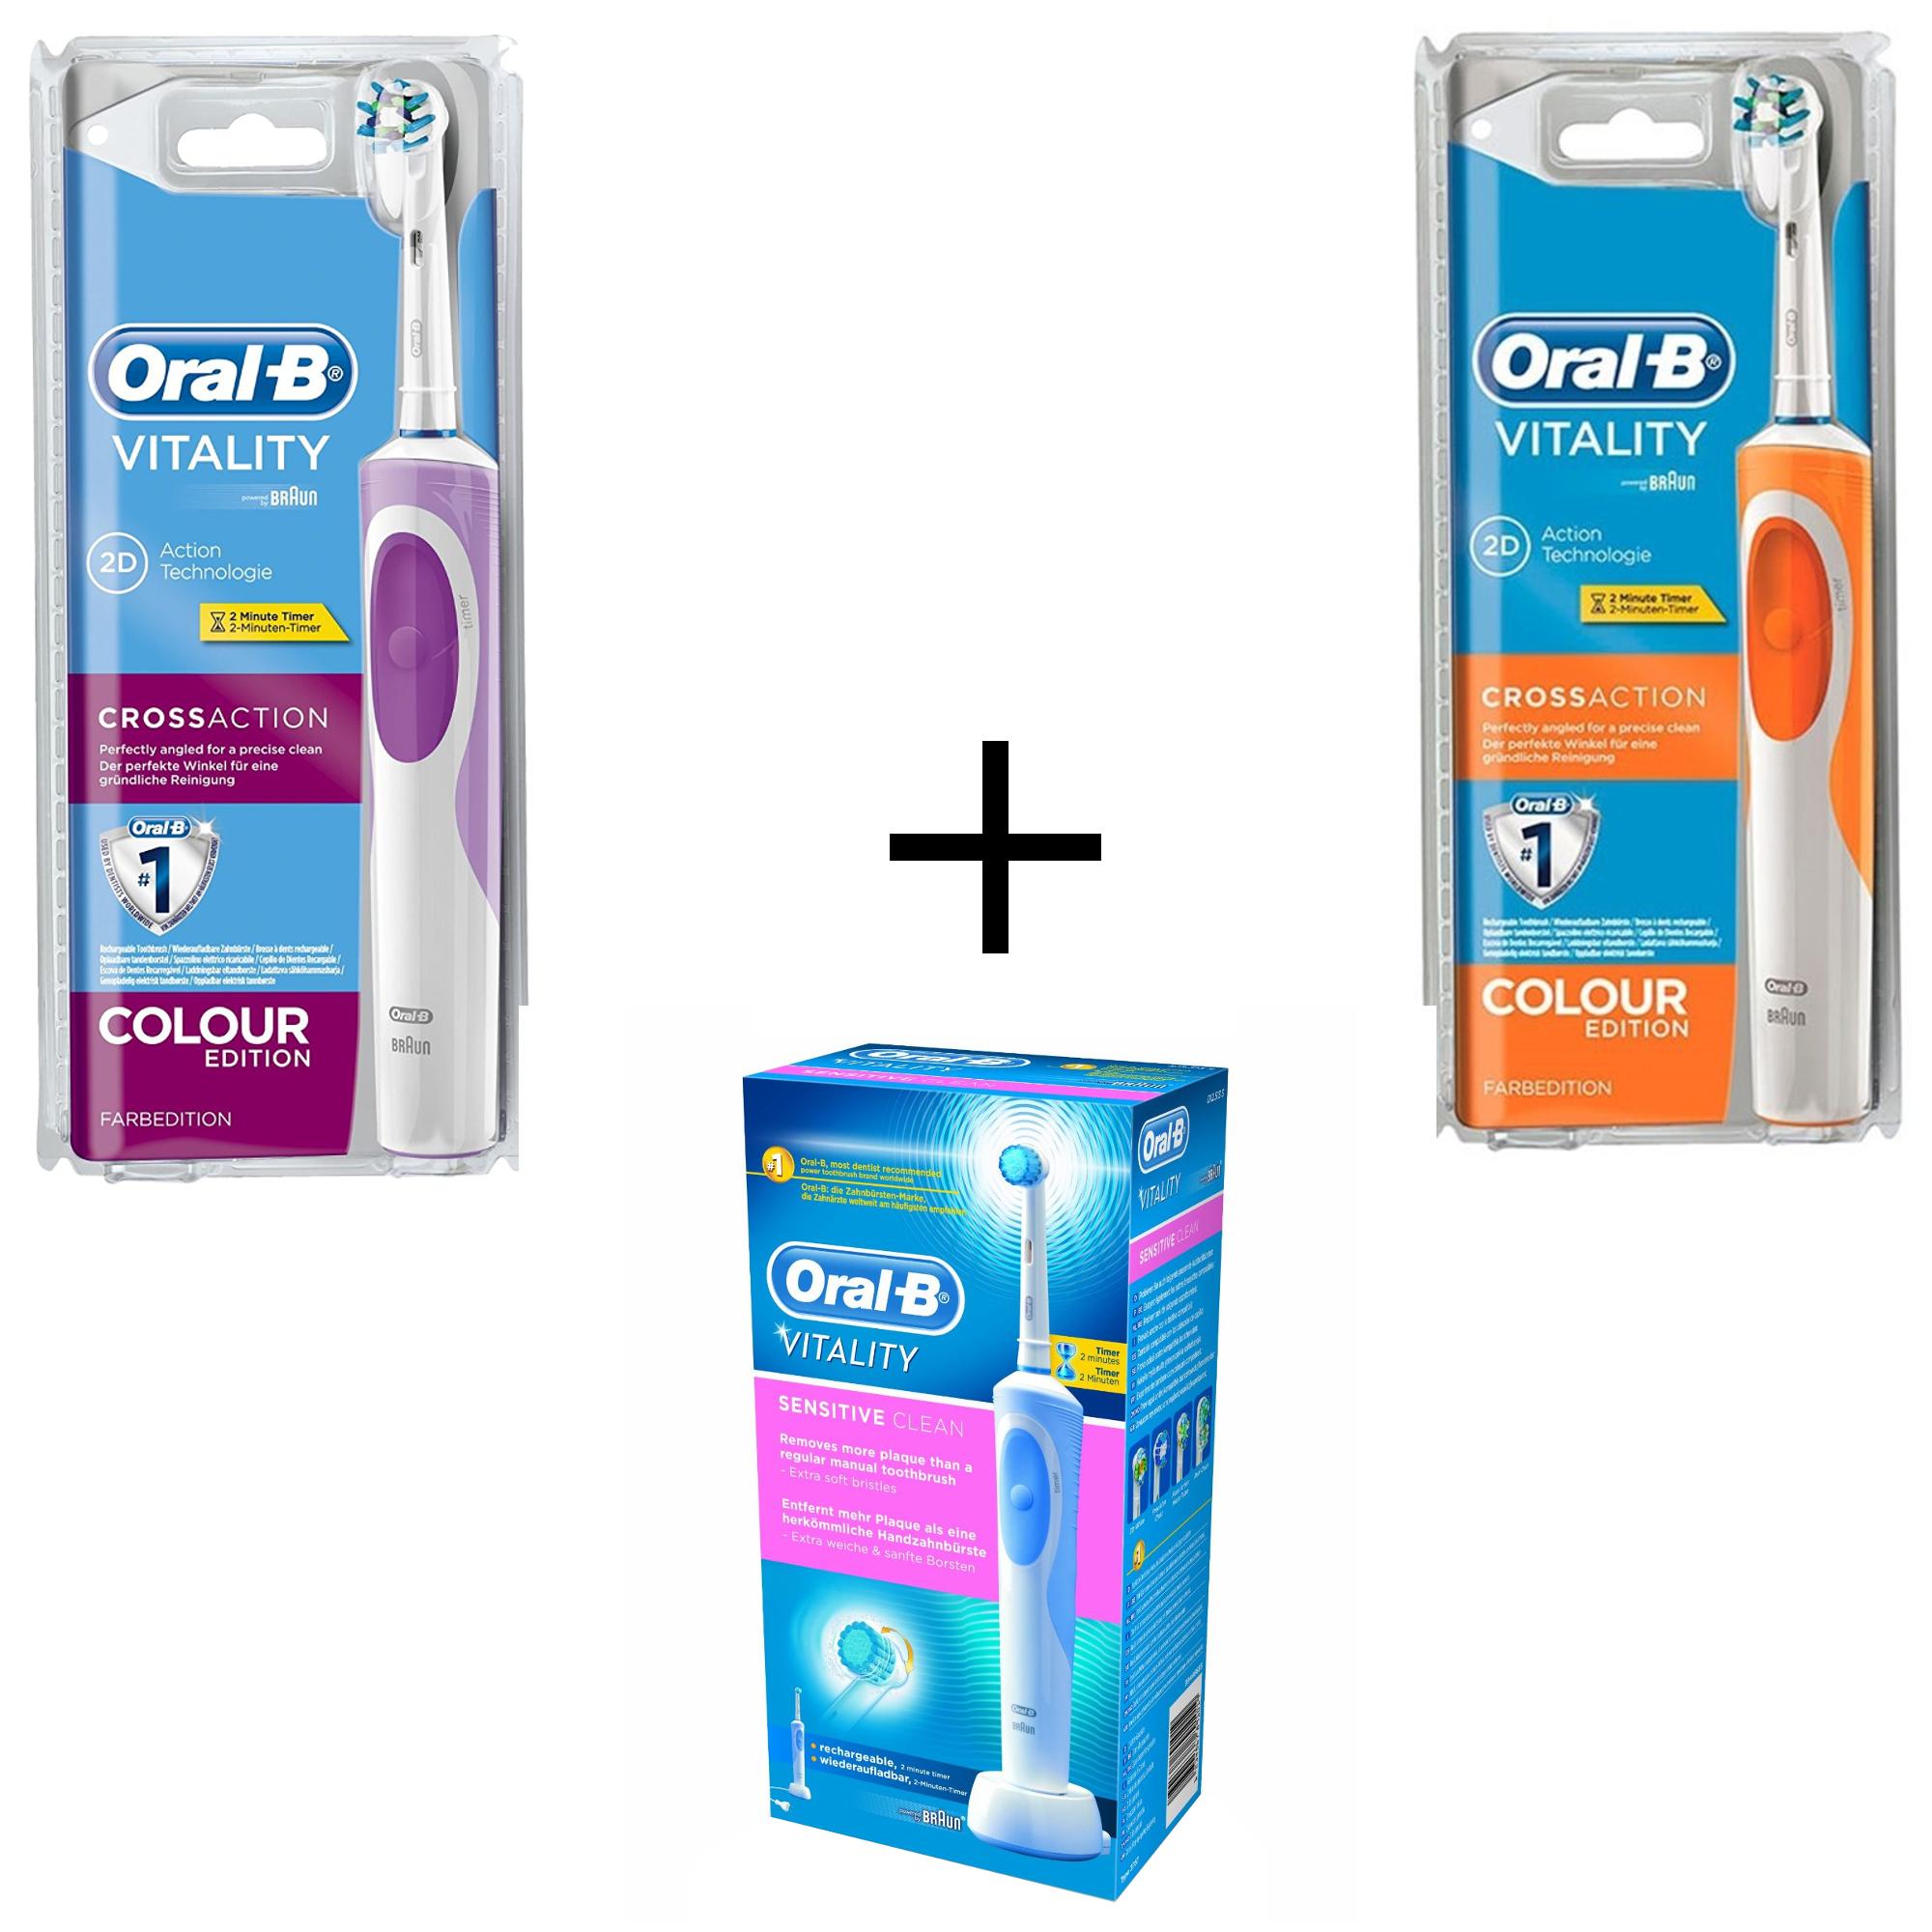 Braun Oral-B Crossaction Purple   Crossaction Naranja cepillo dientes  recargable 60808b5eff05